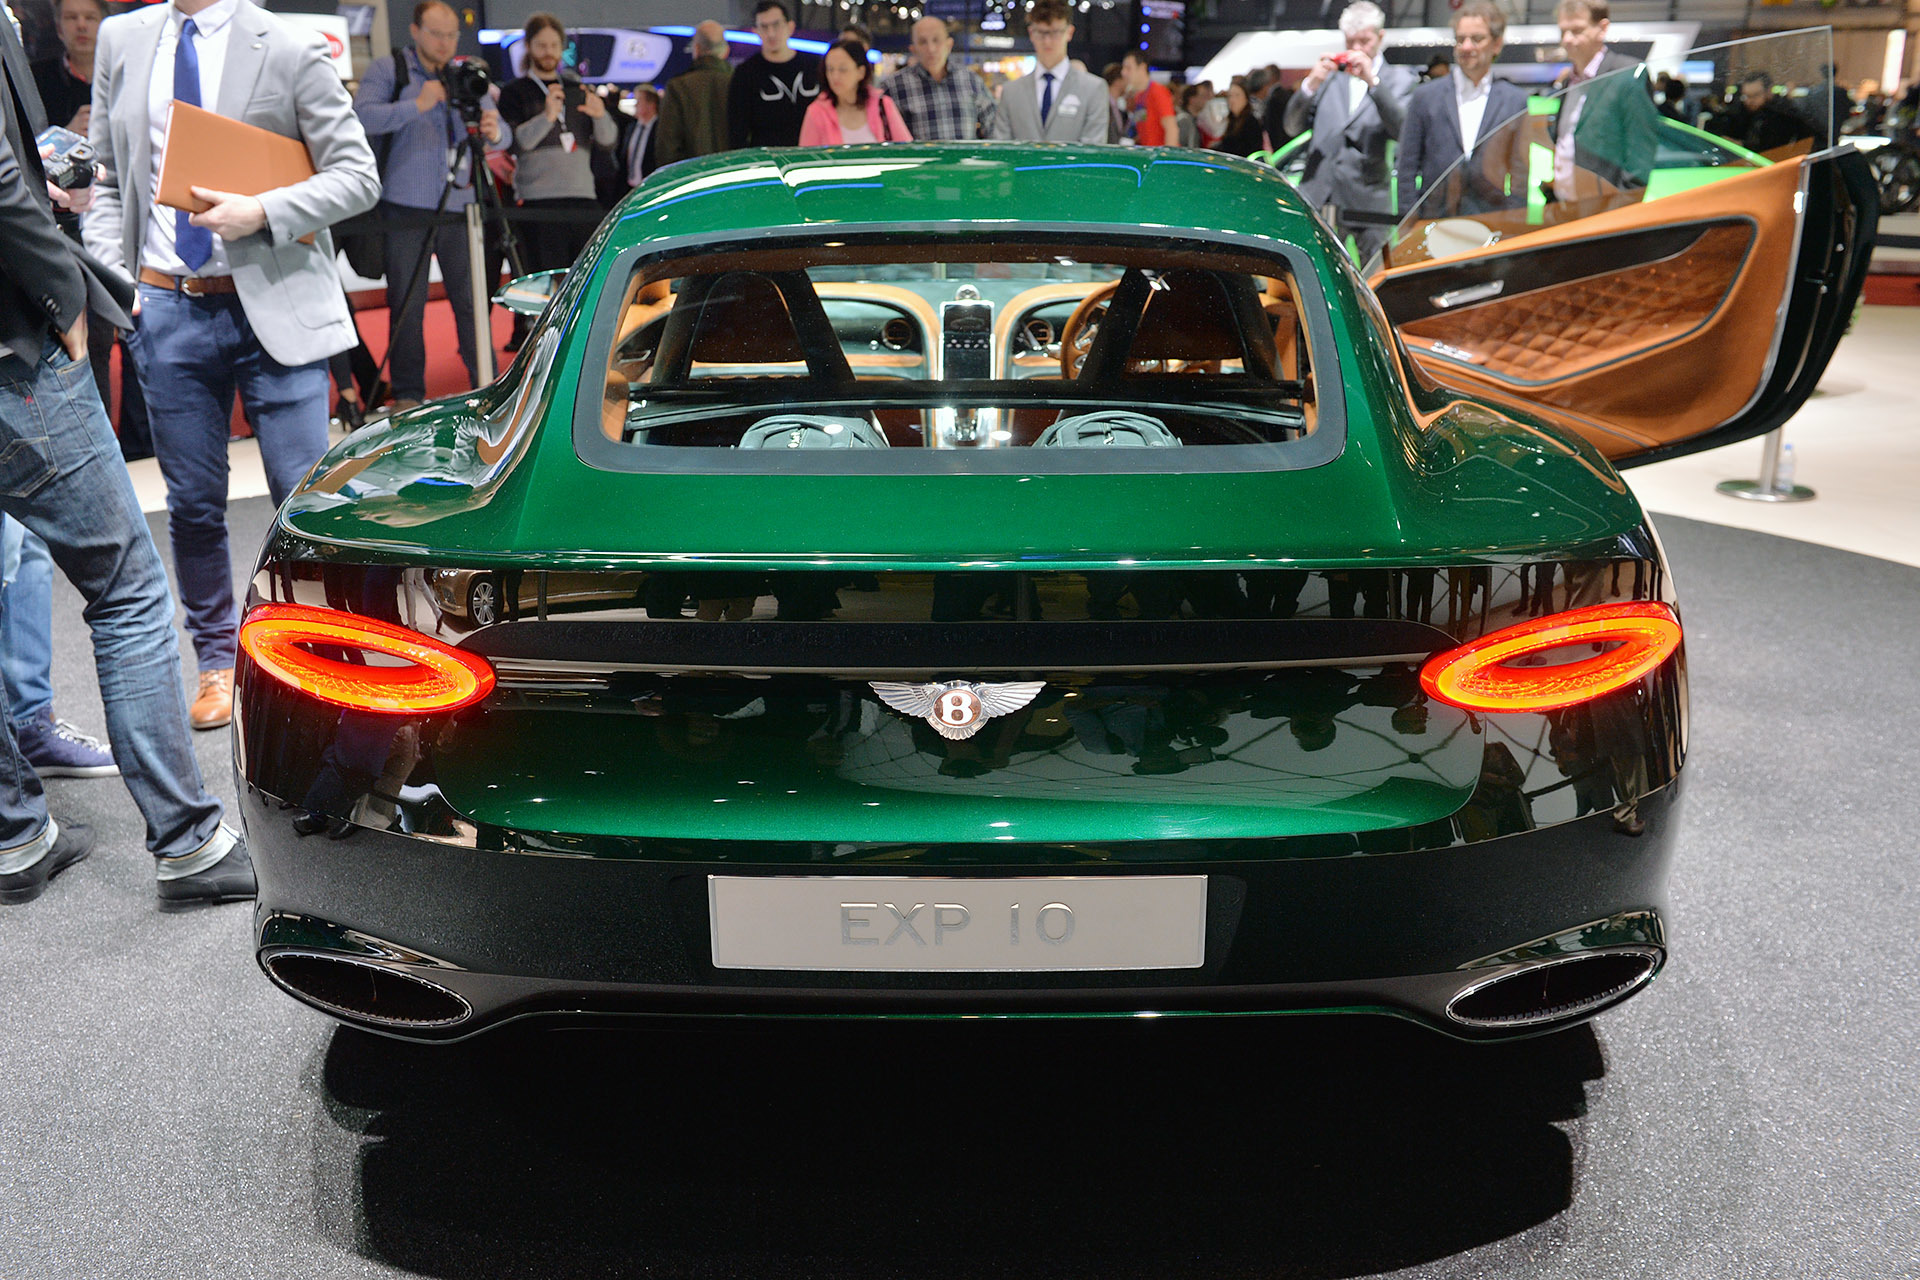 My Kia Performance >> Bentley Revealed EXP 10 Speed 6 Concept At The Geneva ...